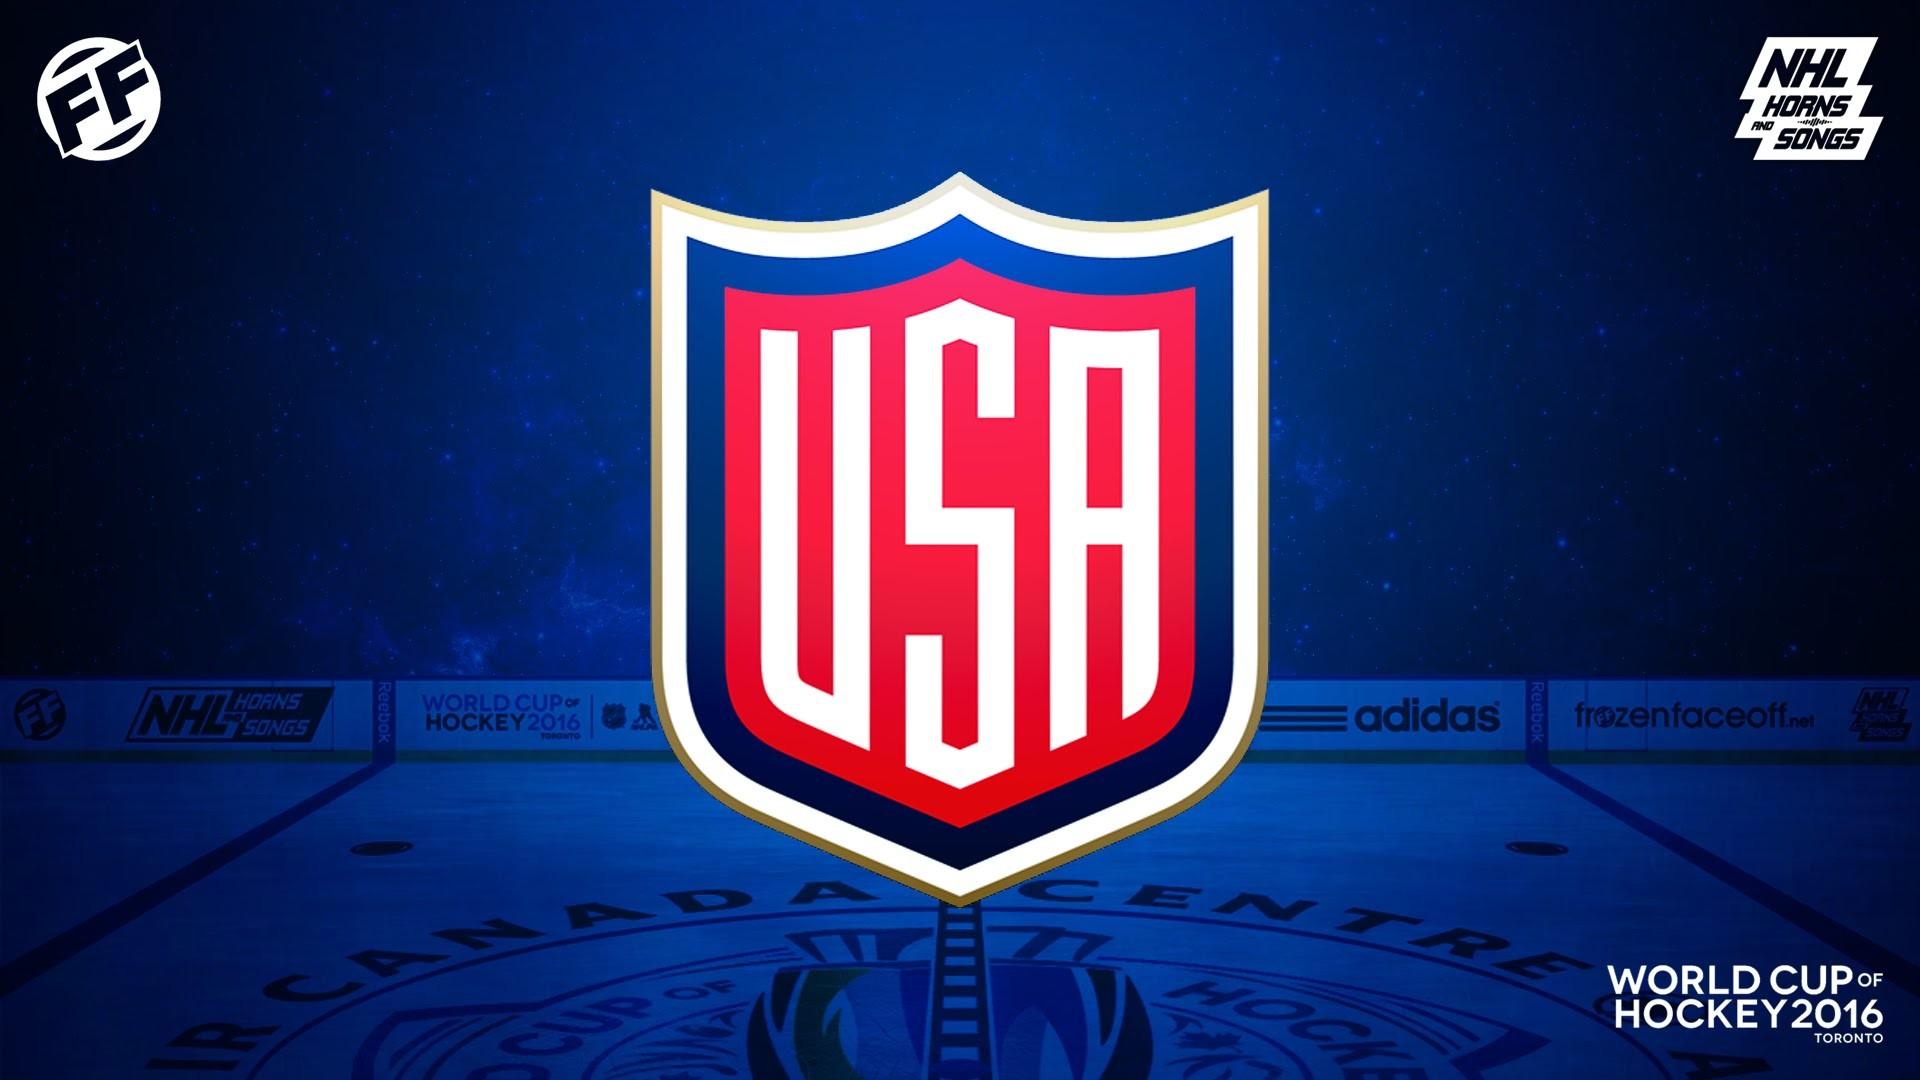 Res: 1920x1080, Team USA 2016 Goal Horn (World Cup of Hockey)